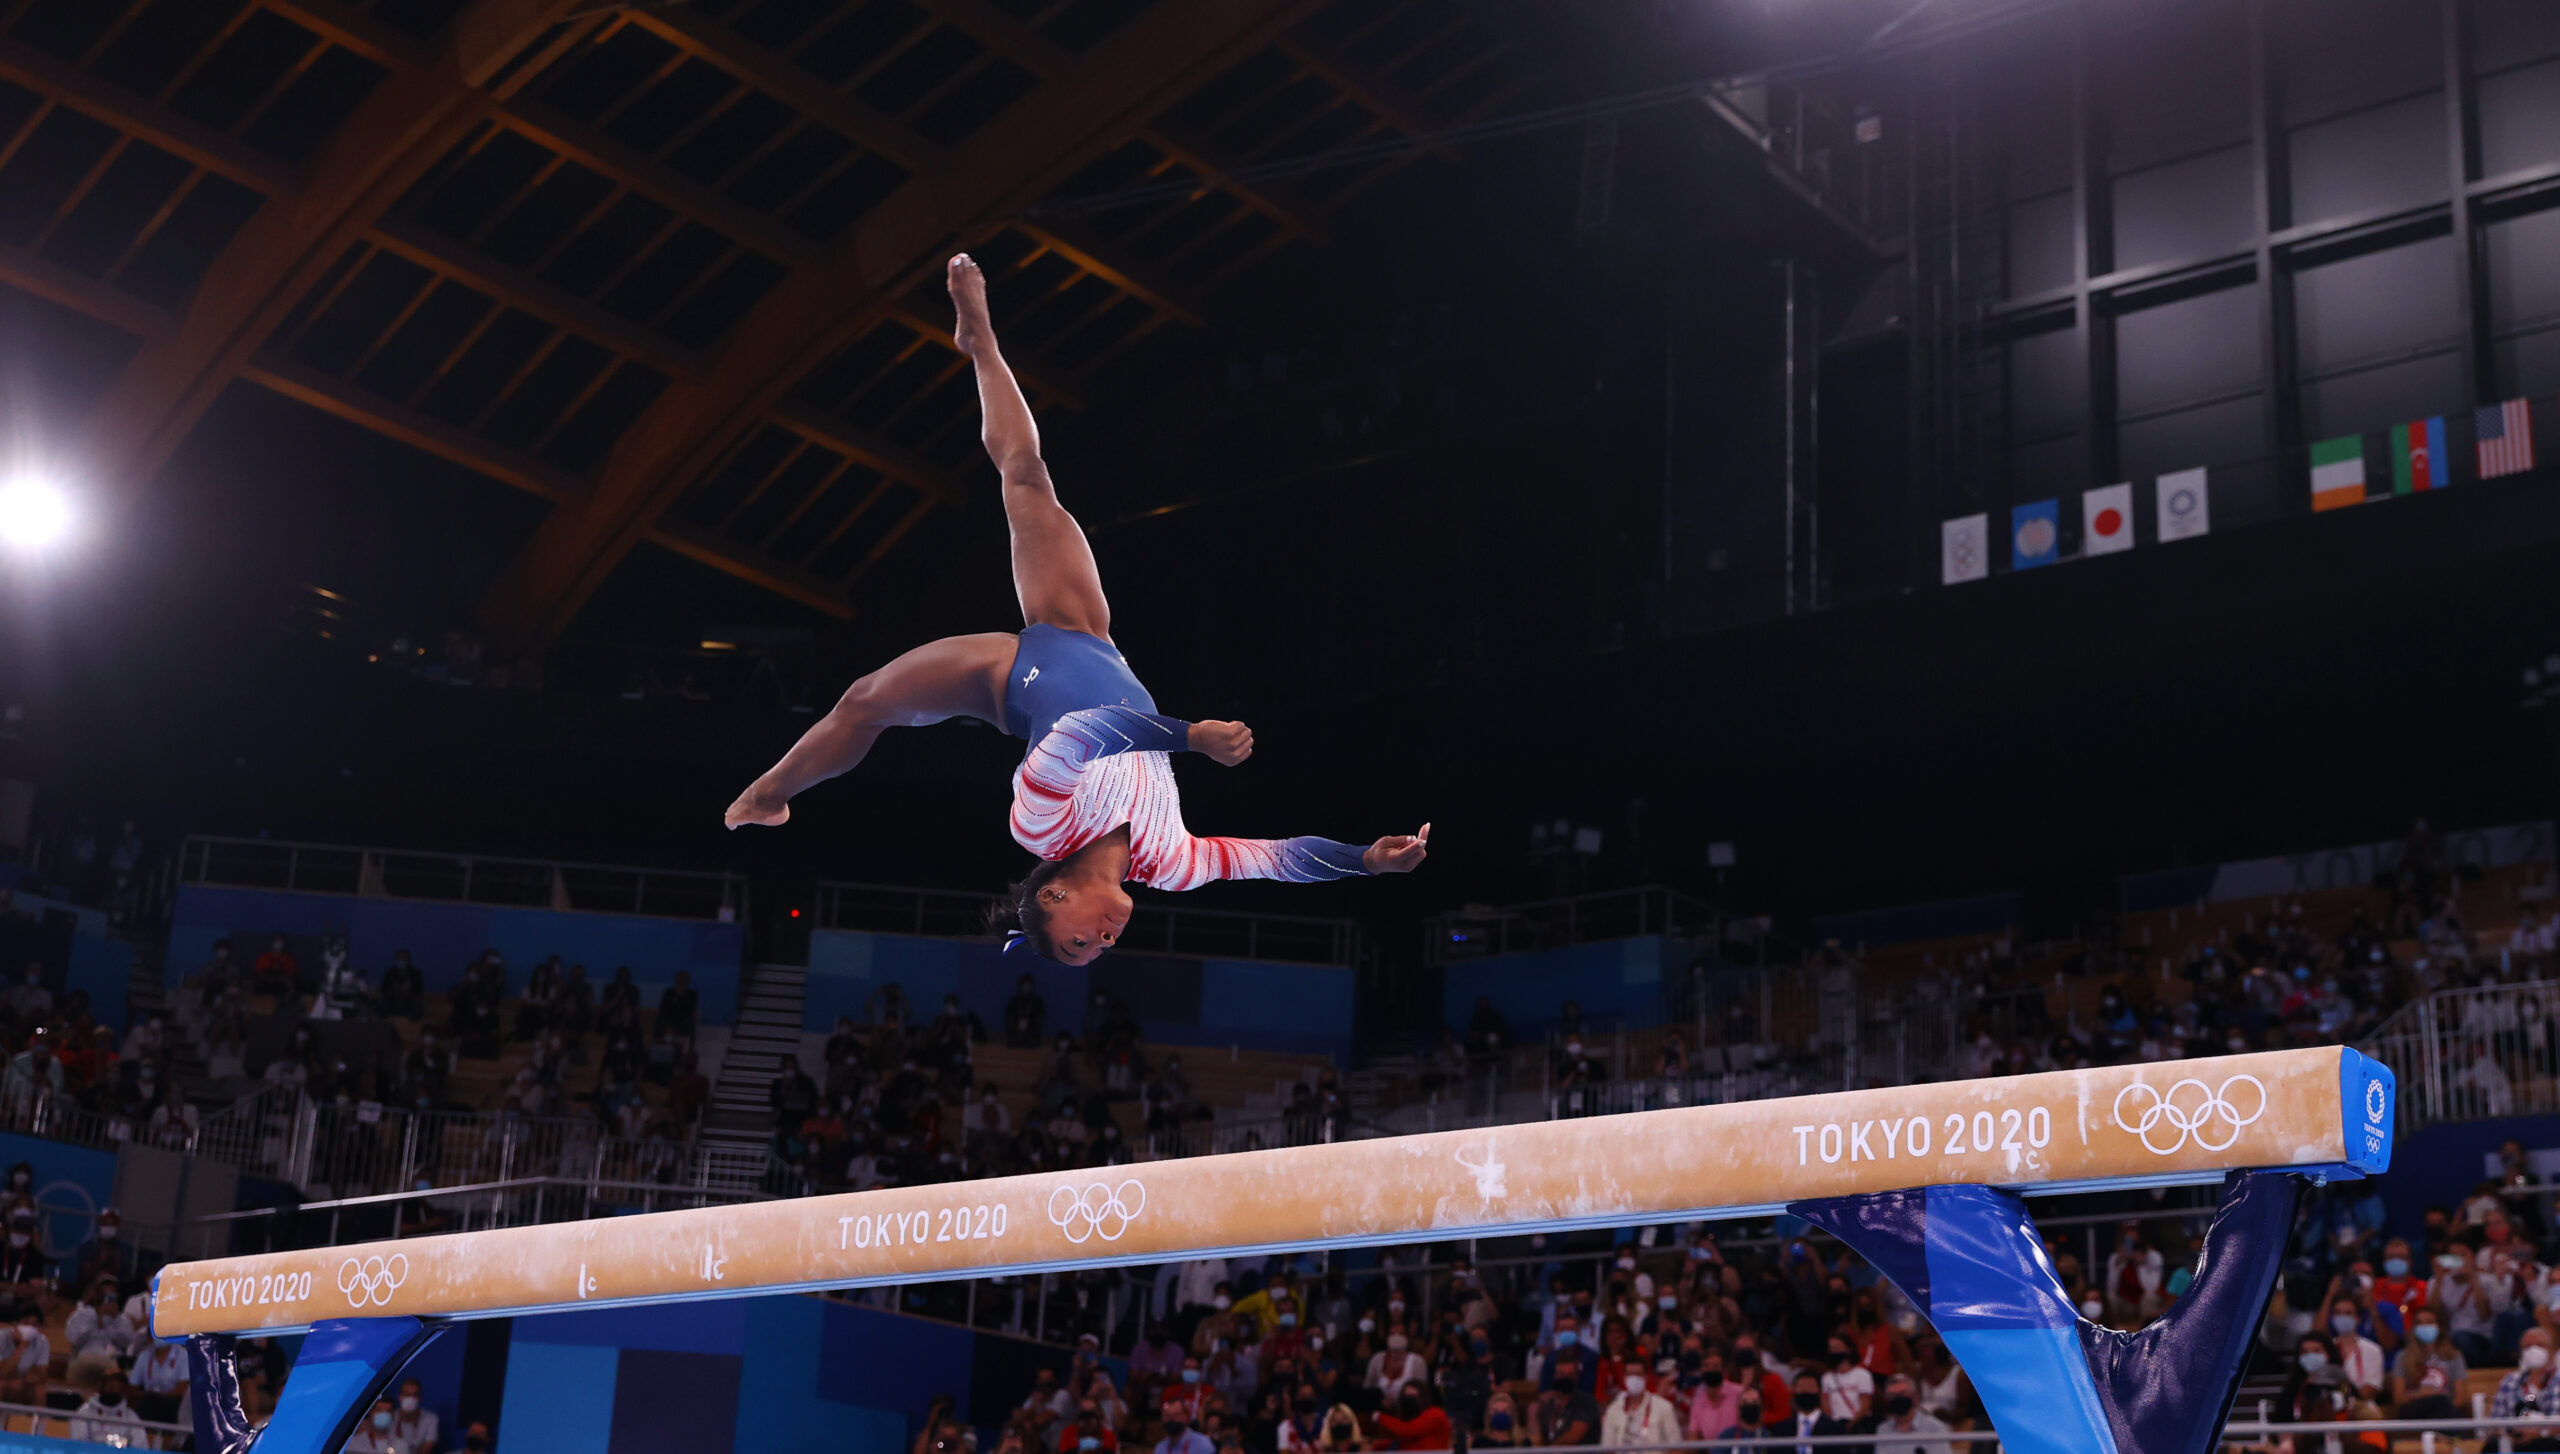 Gymnasts urge U.S. Senate to investigate Larry Nassar sexual abuse after botched FBI inquiry